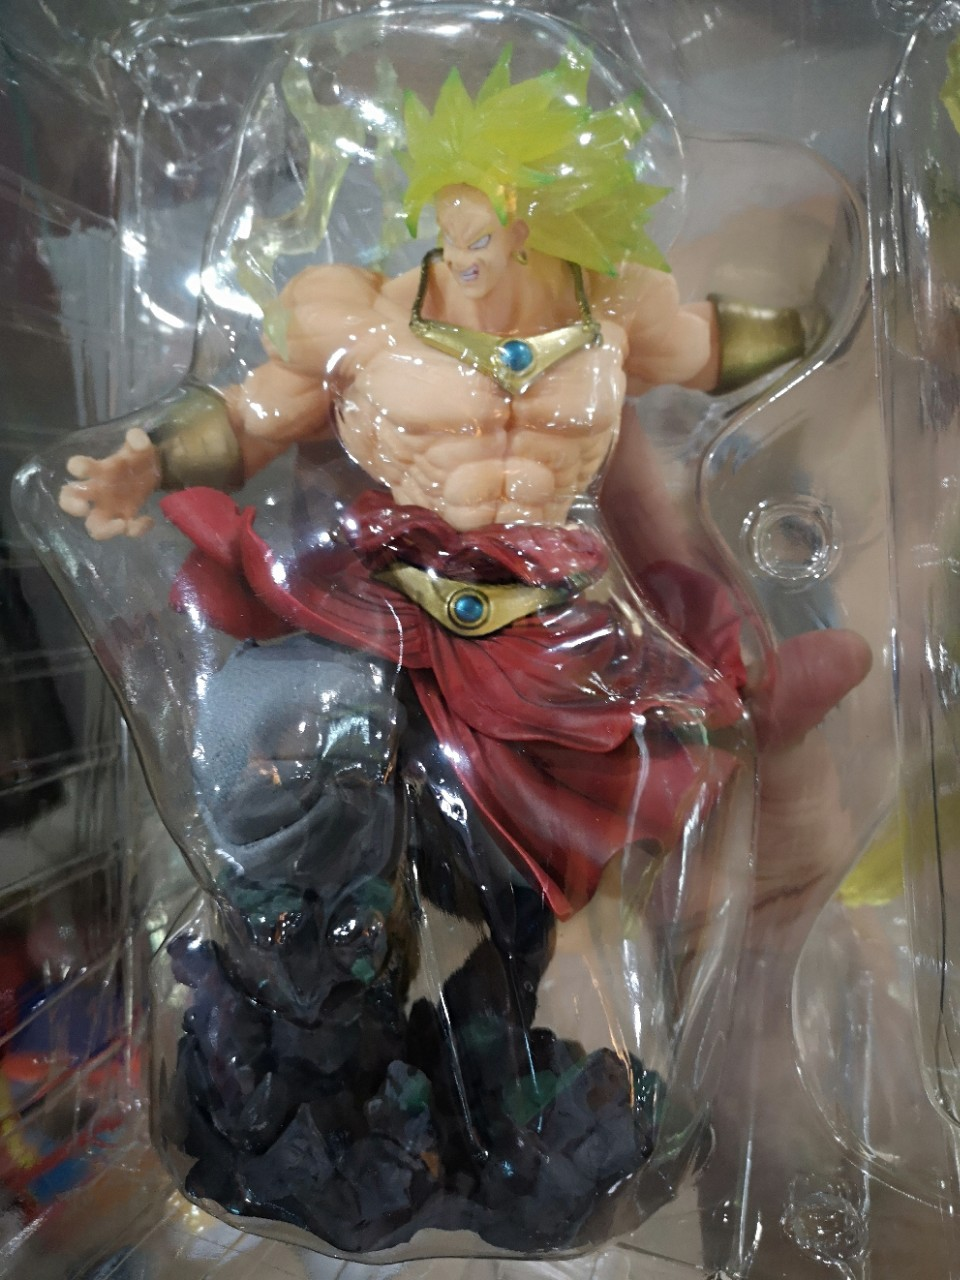 Новые горячие Dragon Ball Z фигурка F. ZERO Супер Saiyan Broli фигурку Broly ПВХ 32 см - 6